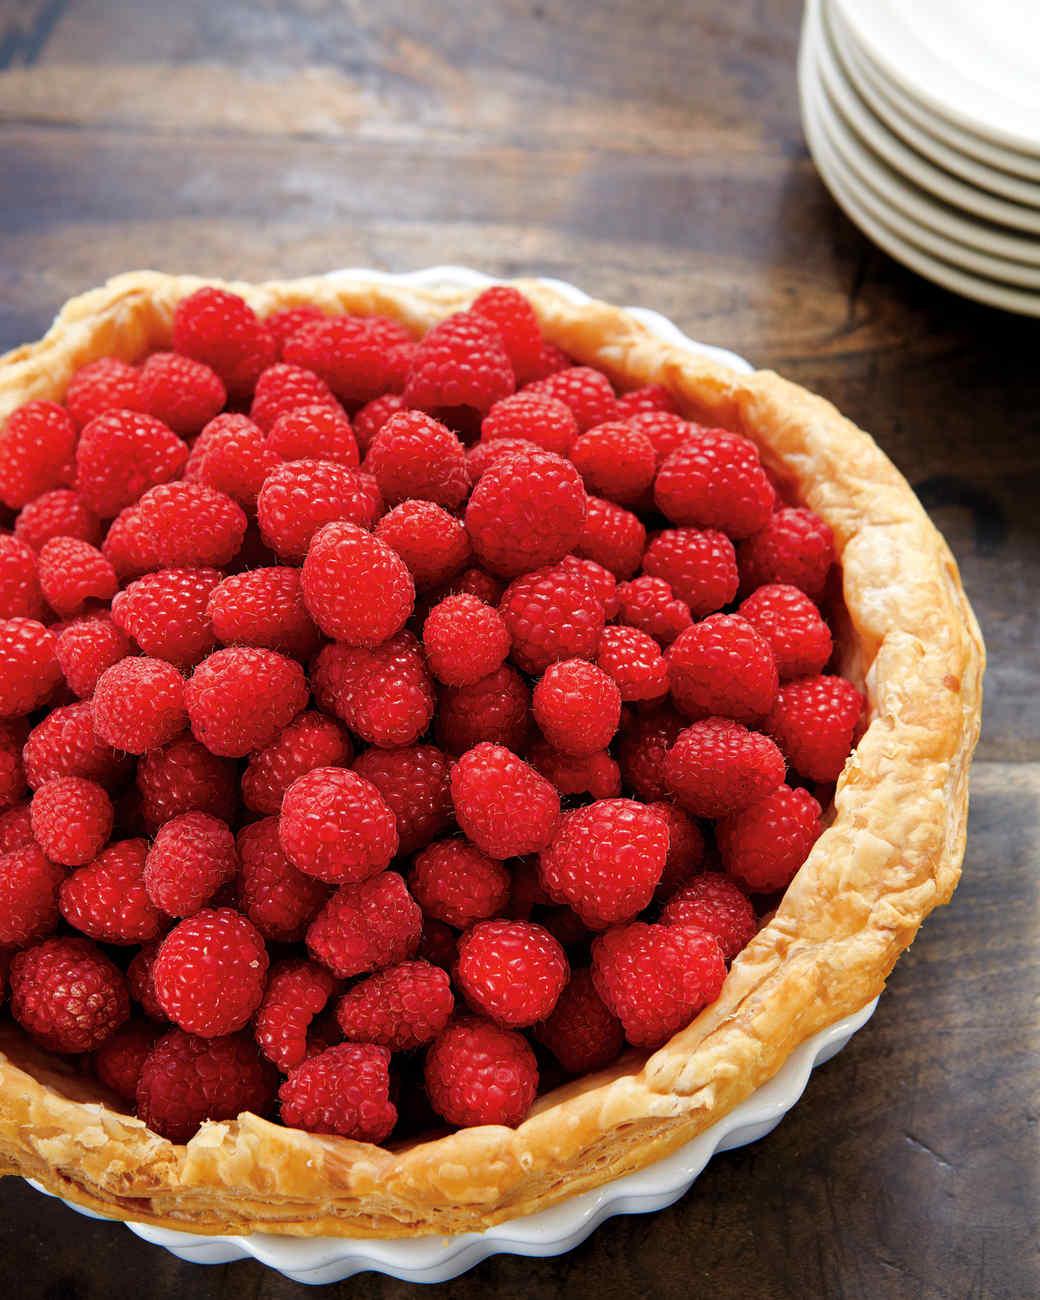 raspberry-dessert-mld108157.jpg